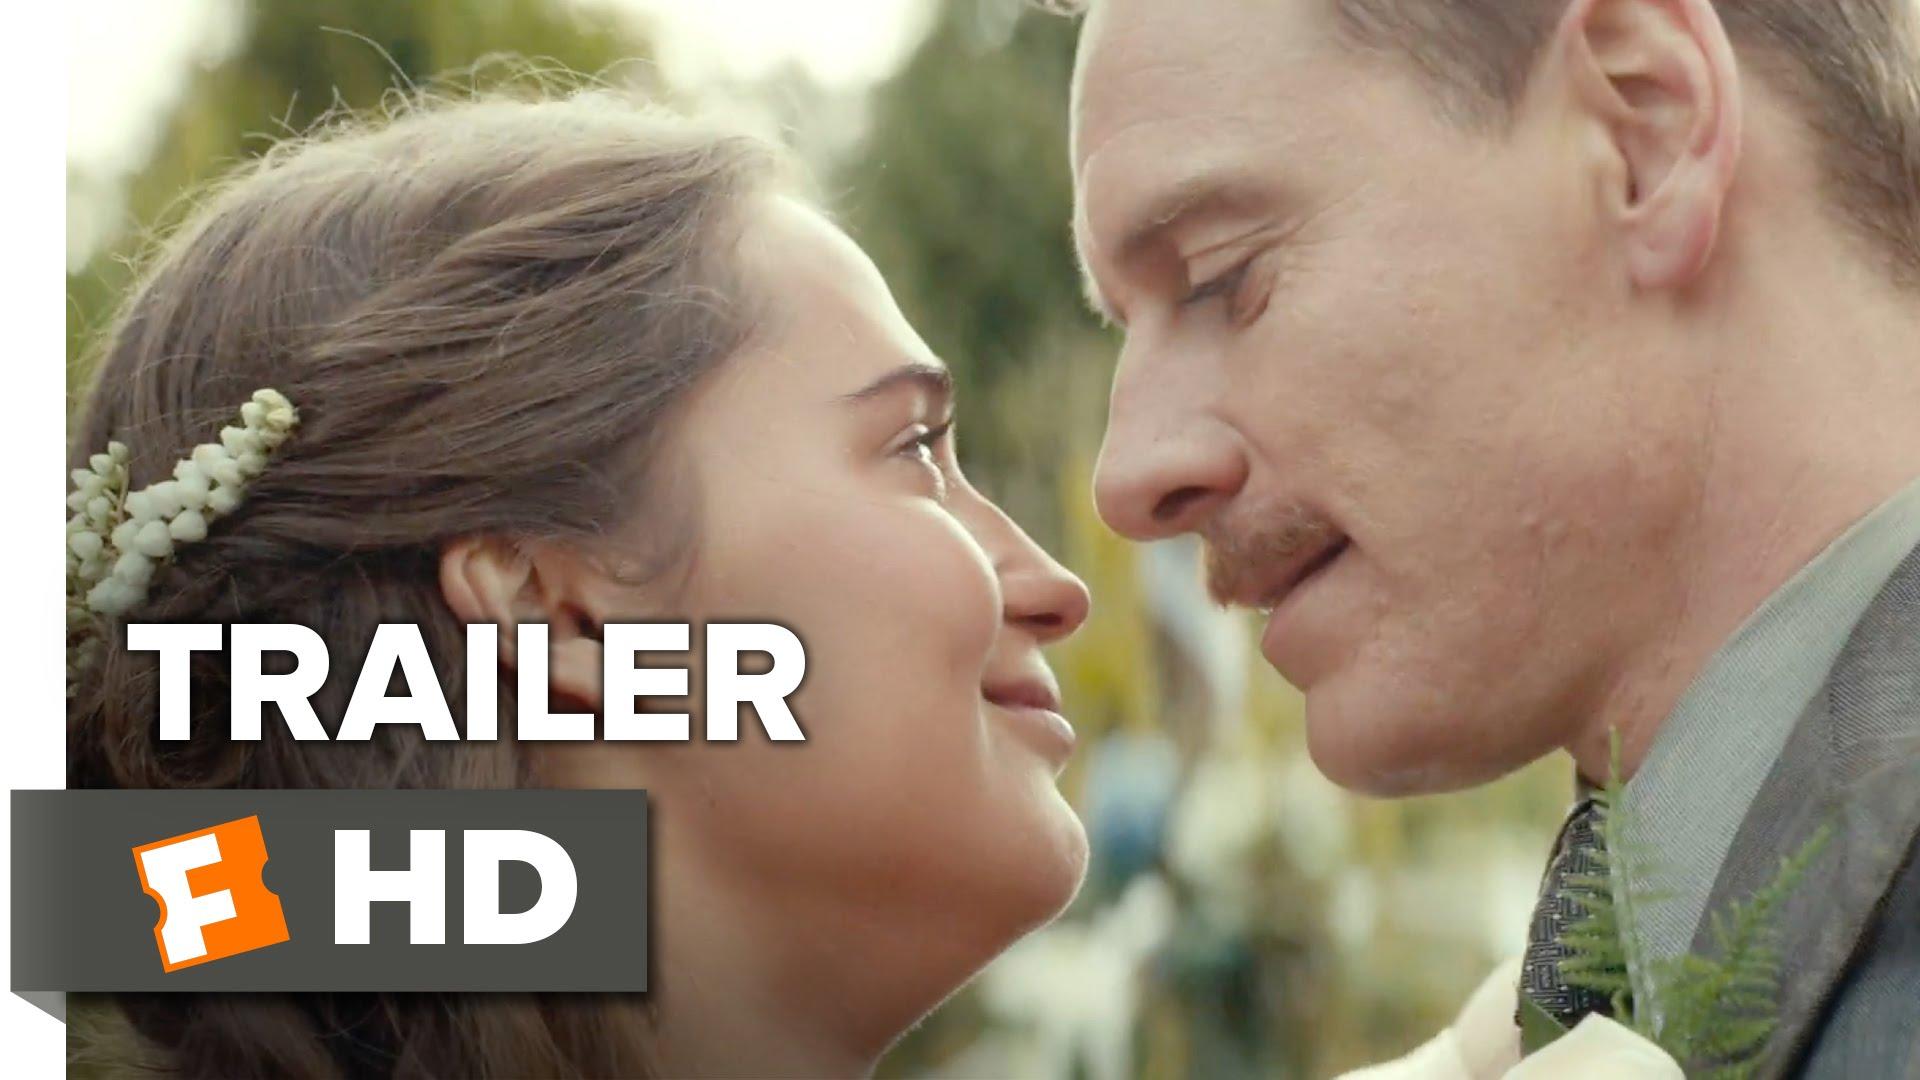 The Light Between Oceans Official Trailer #1 (2016) - Alicia Vikander, Michael Fassbender Movie HD